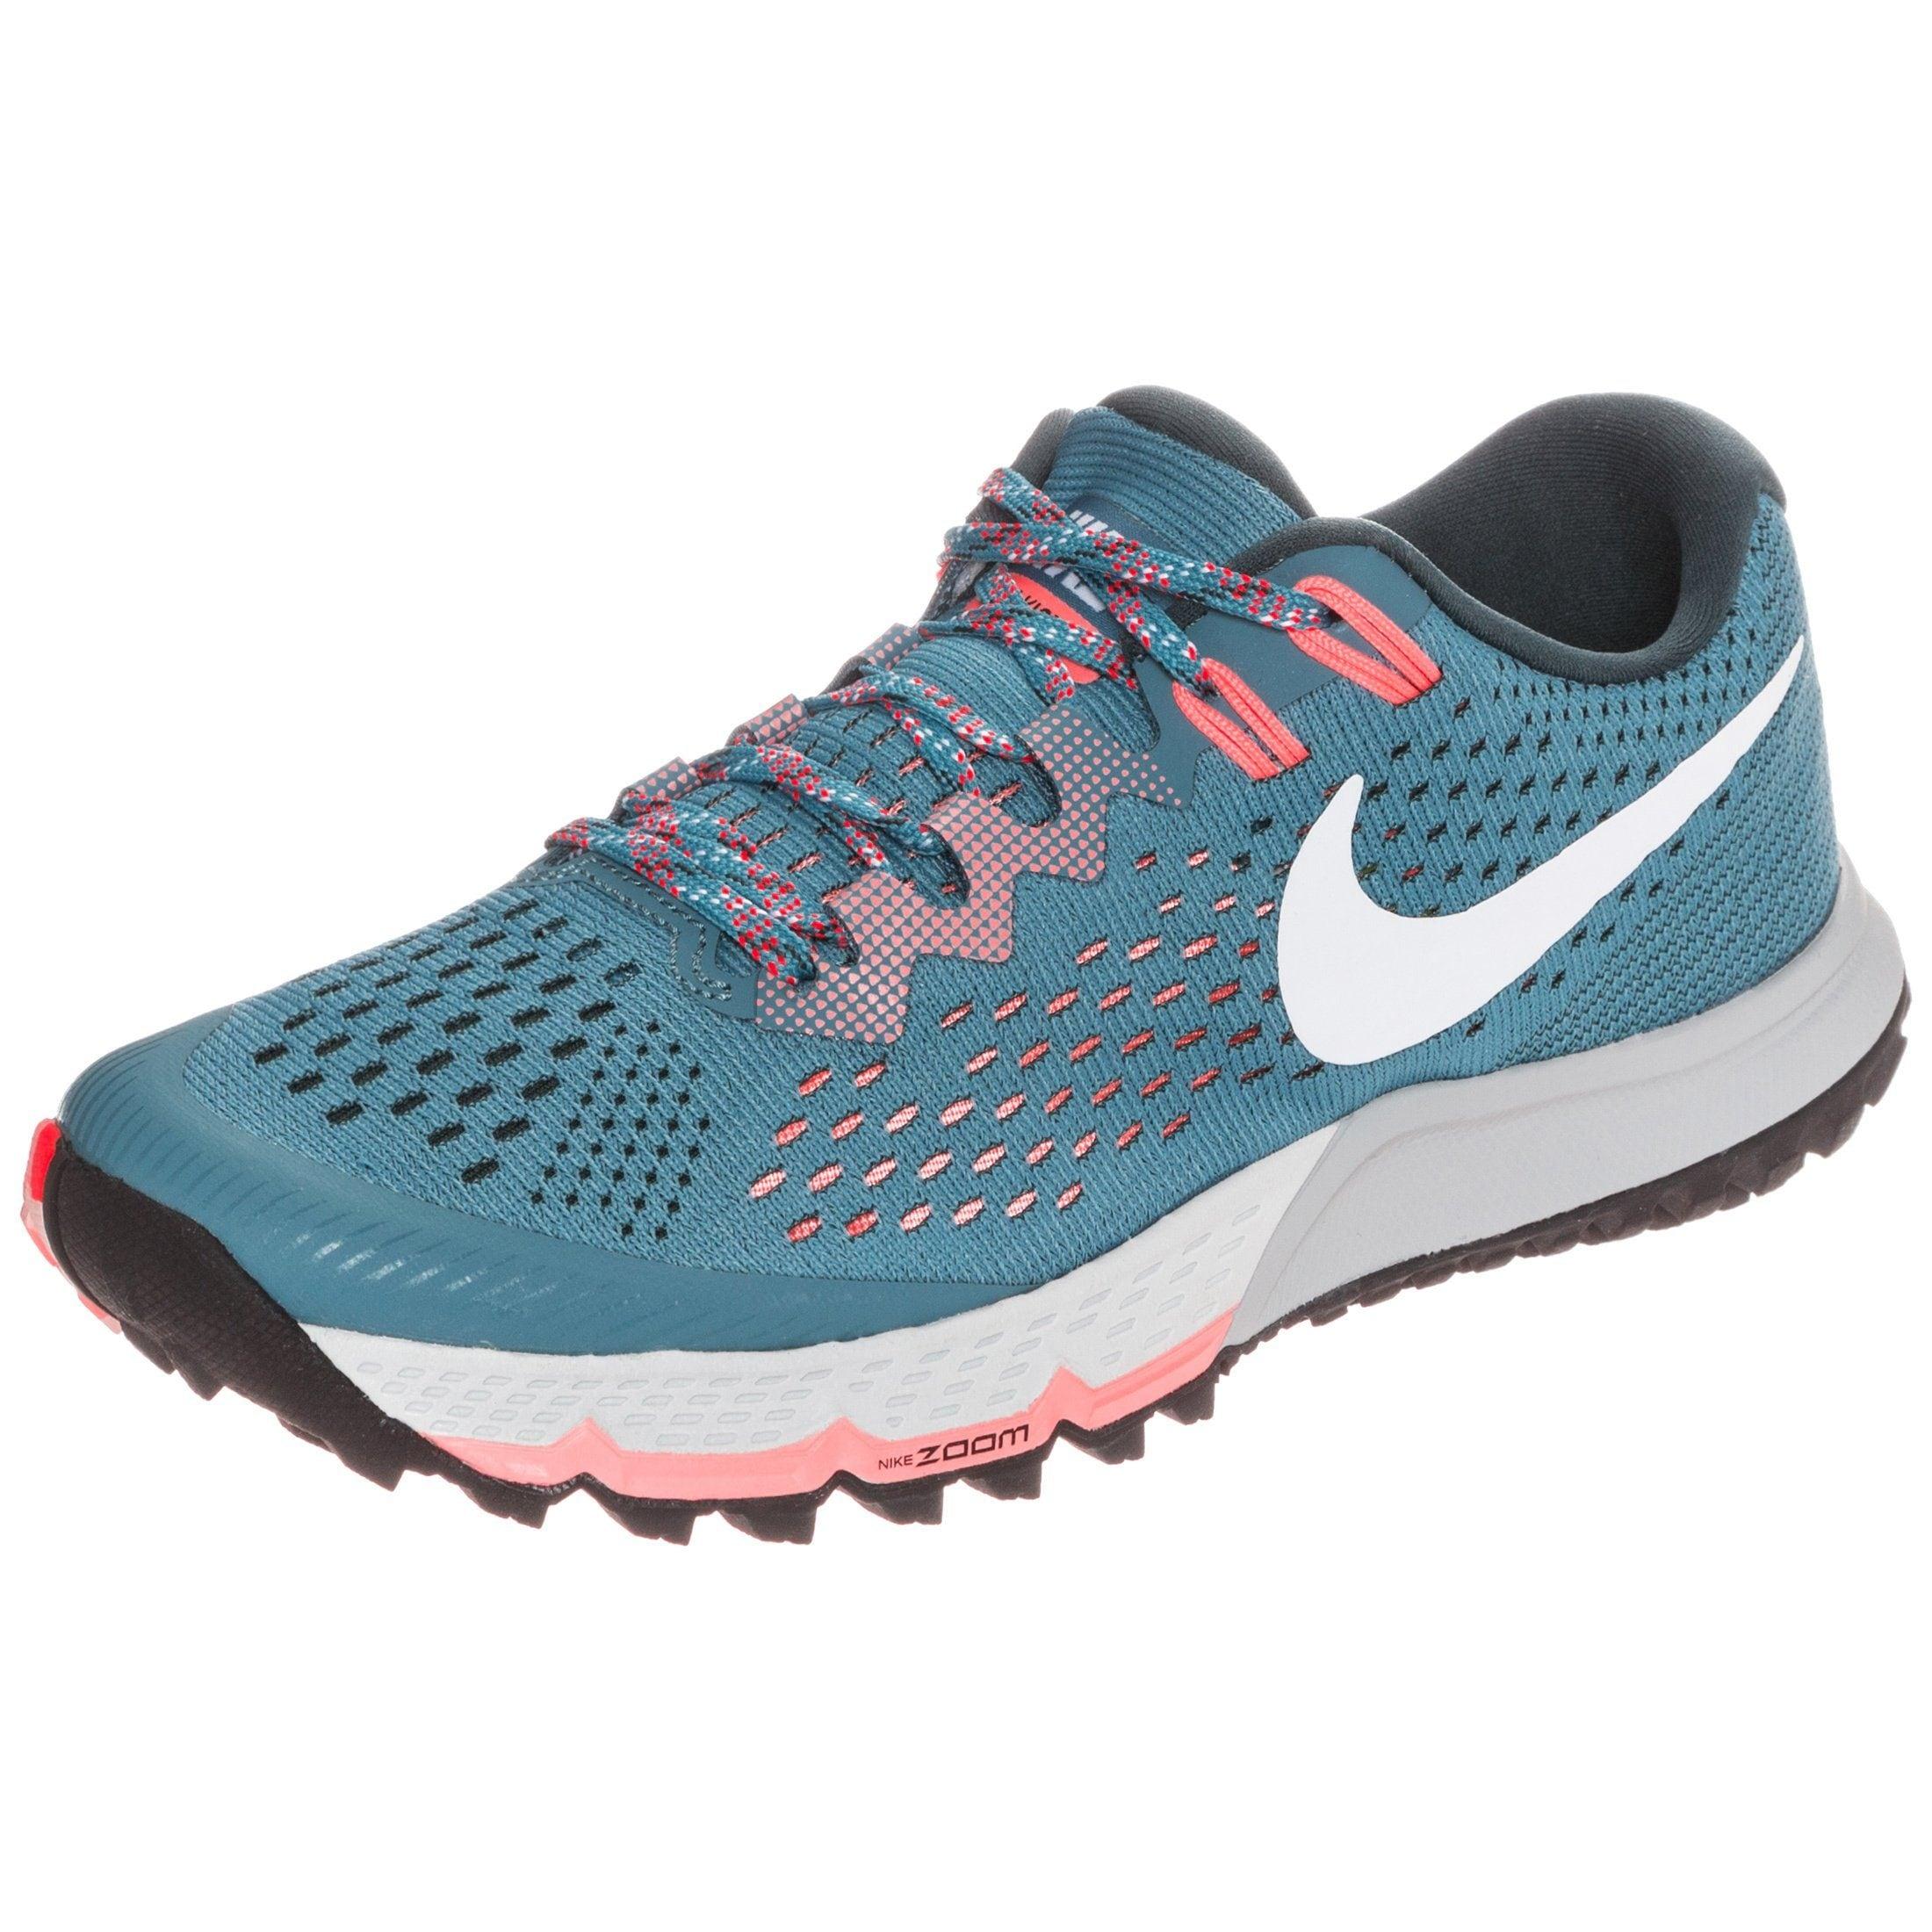 00888411712817 Bei imwalking   Damen Nike Laufschuh Air Zoom Terra Kiger 4   00888411712817